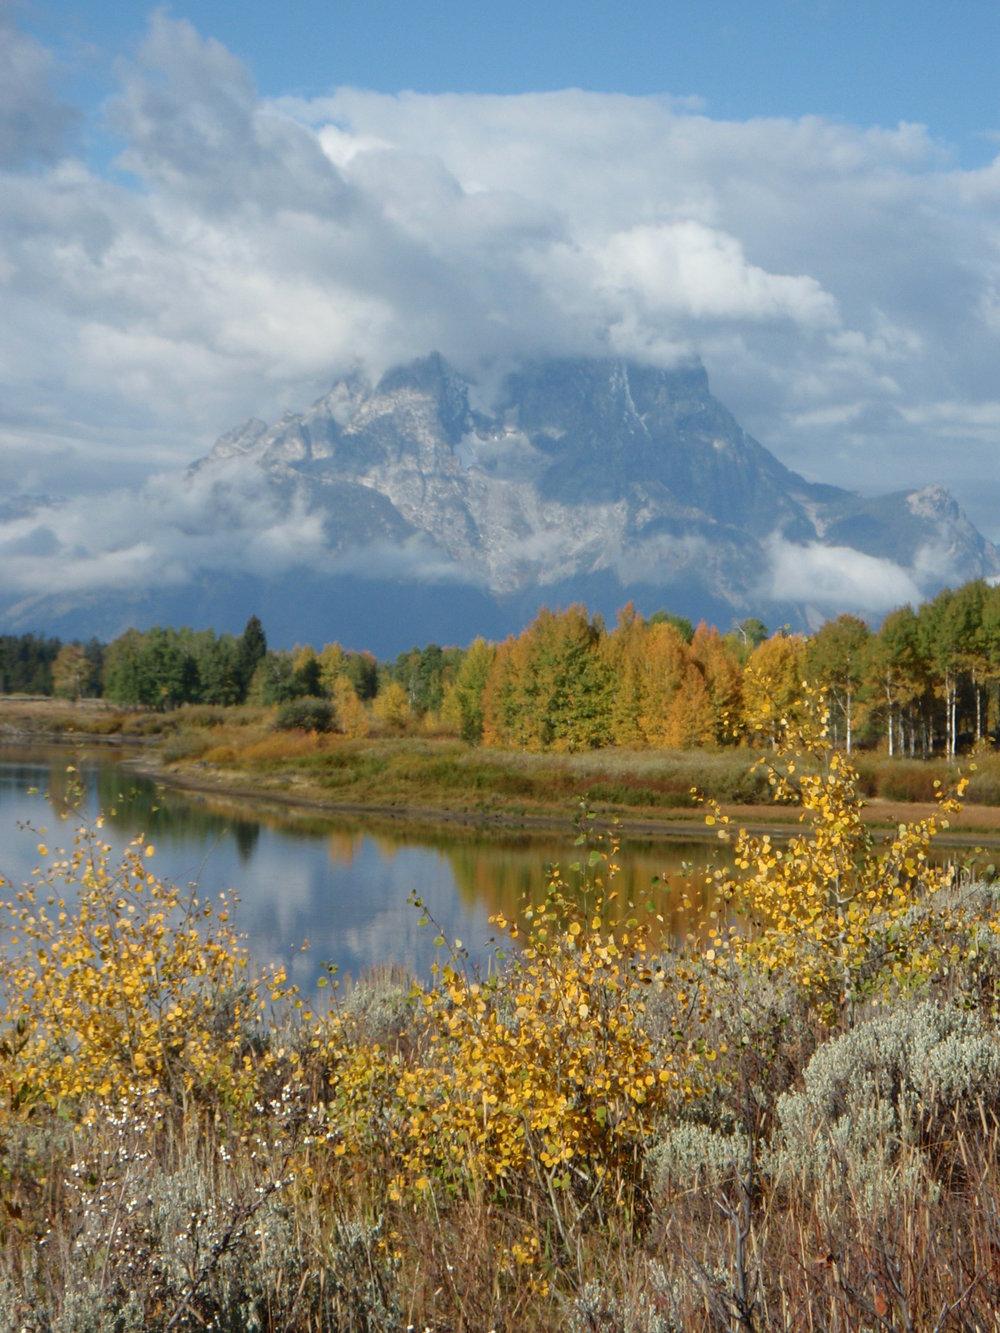 Oxbow Bend Turnout en route to Grand Teton National Park